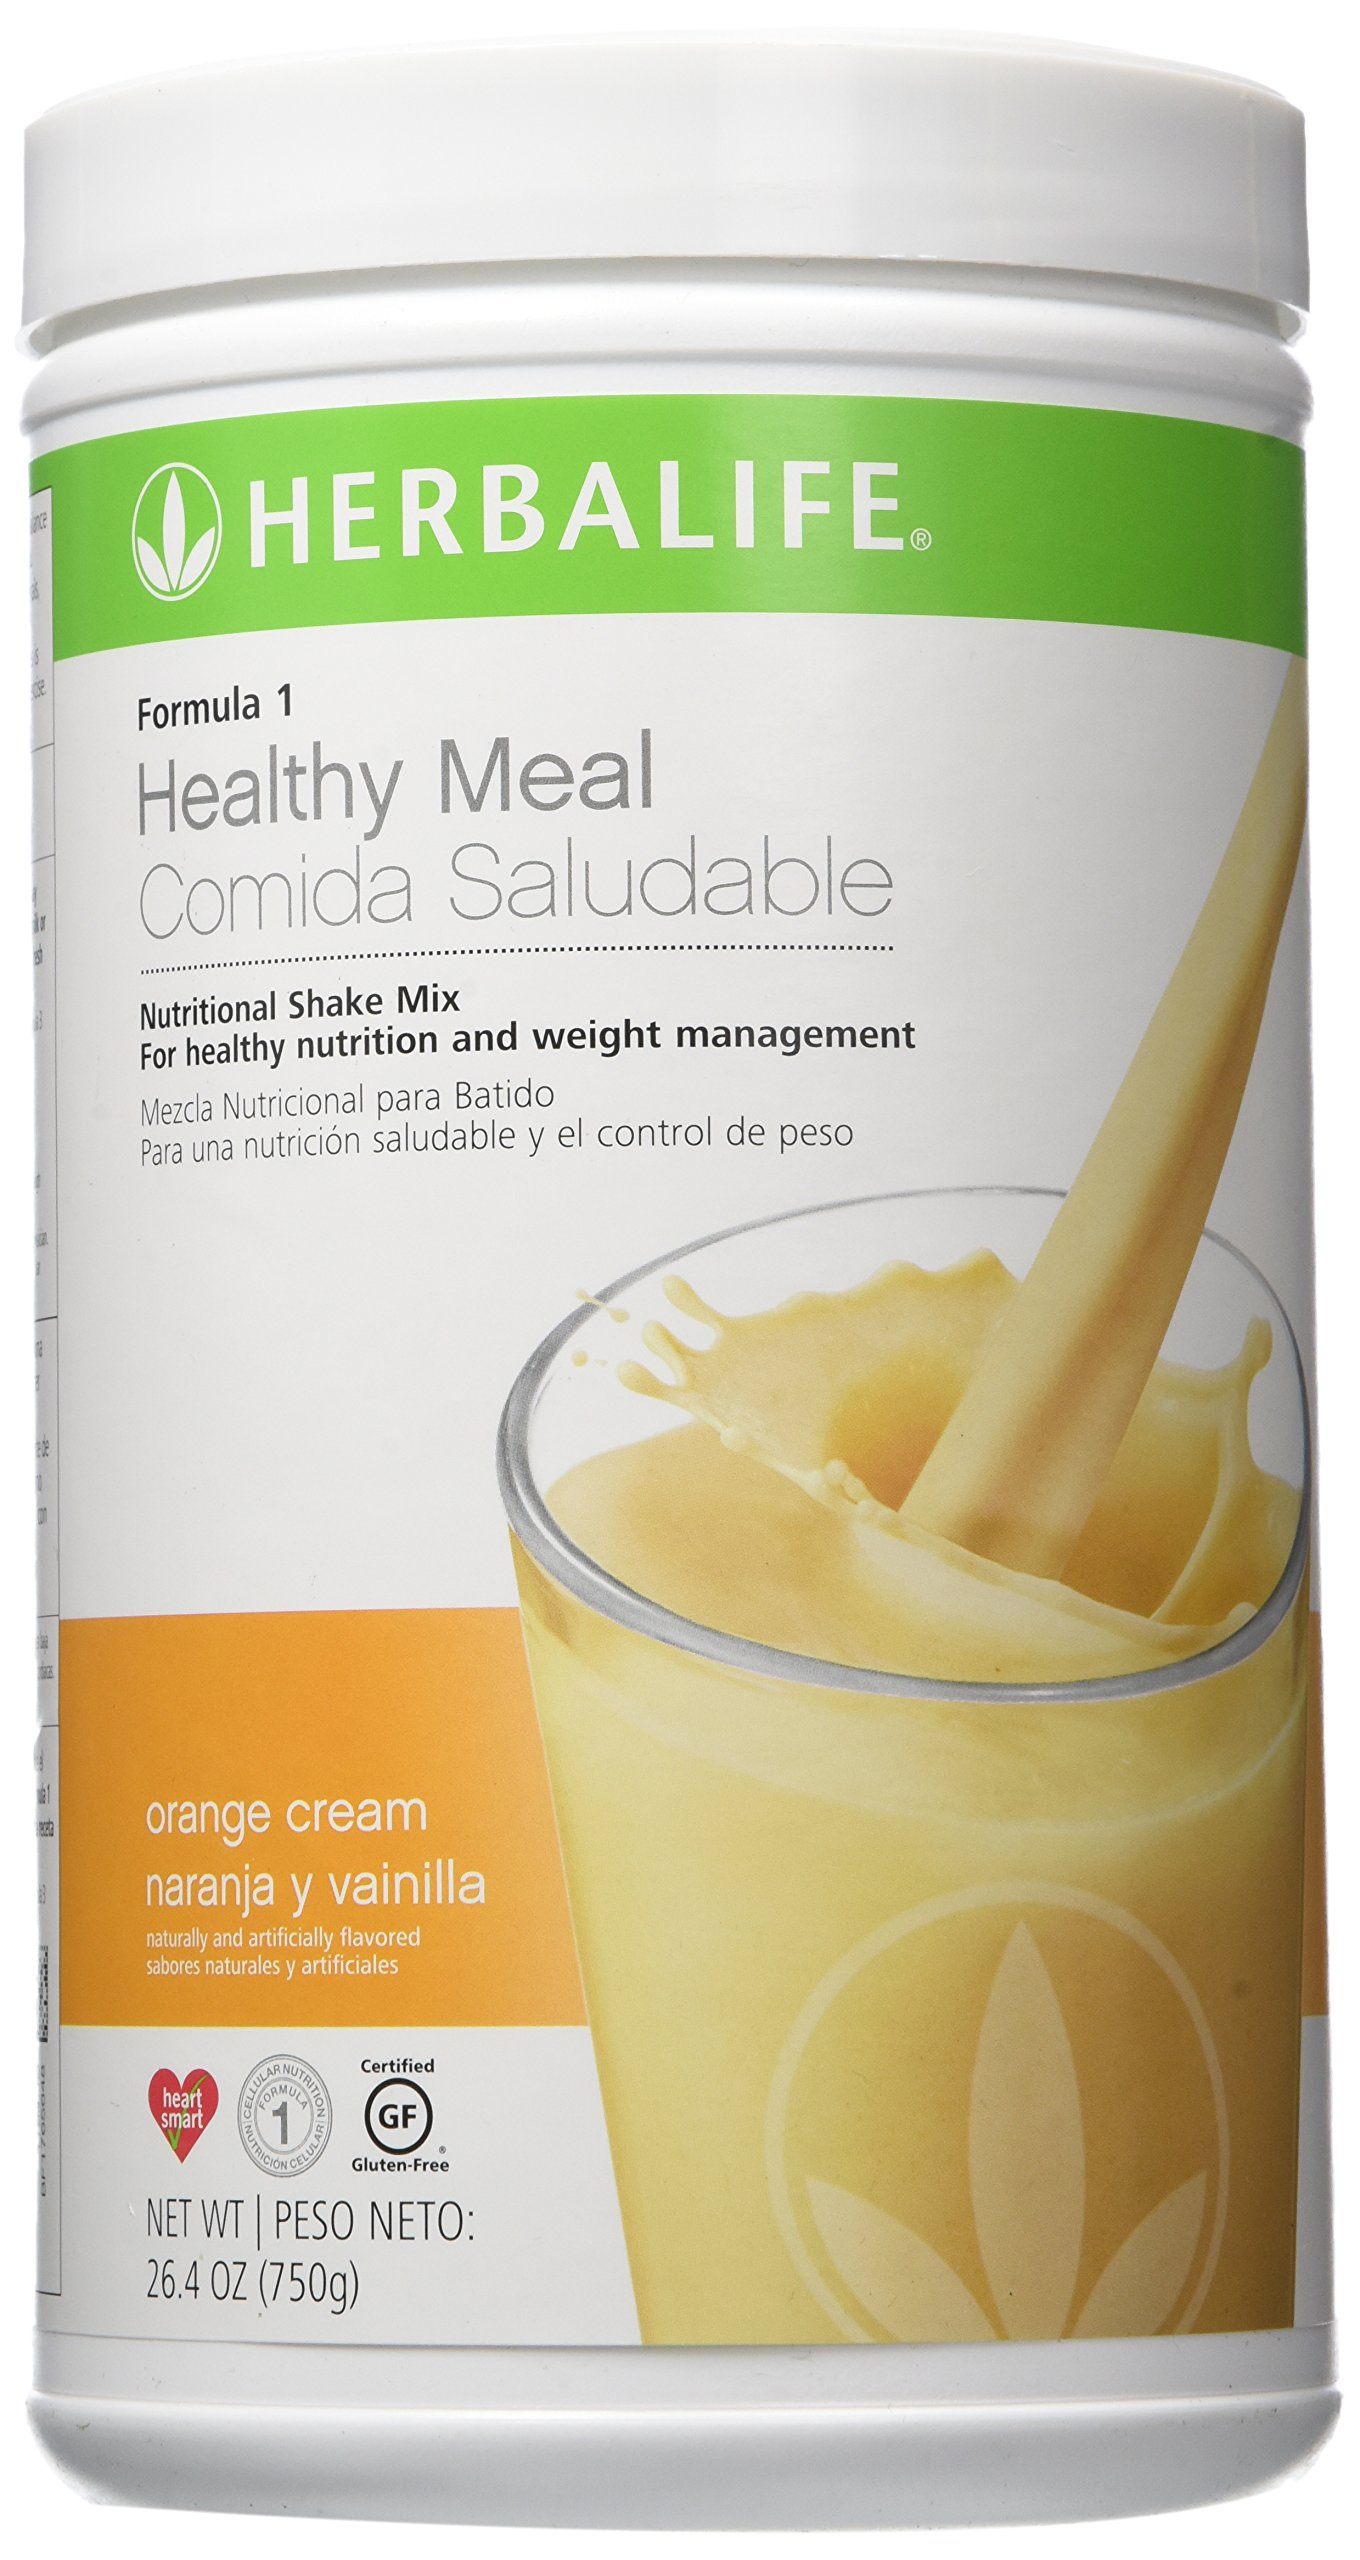 Herbalife Formula 1 Nutritional Shake Mix, Orange Cream Naranja/Vainilla, 26.4 Ounce